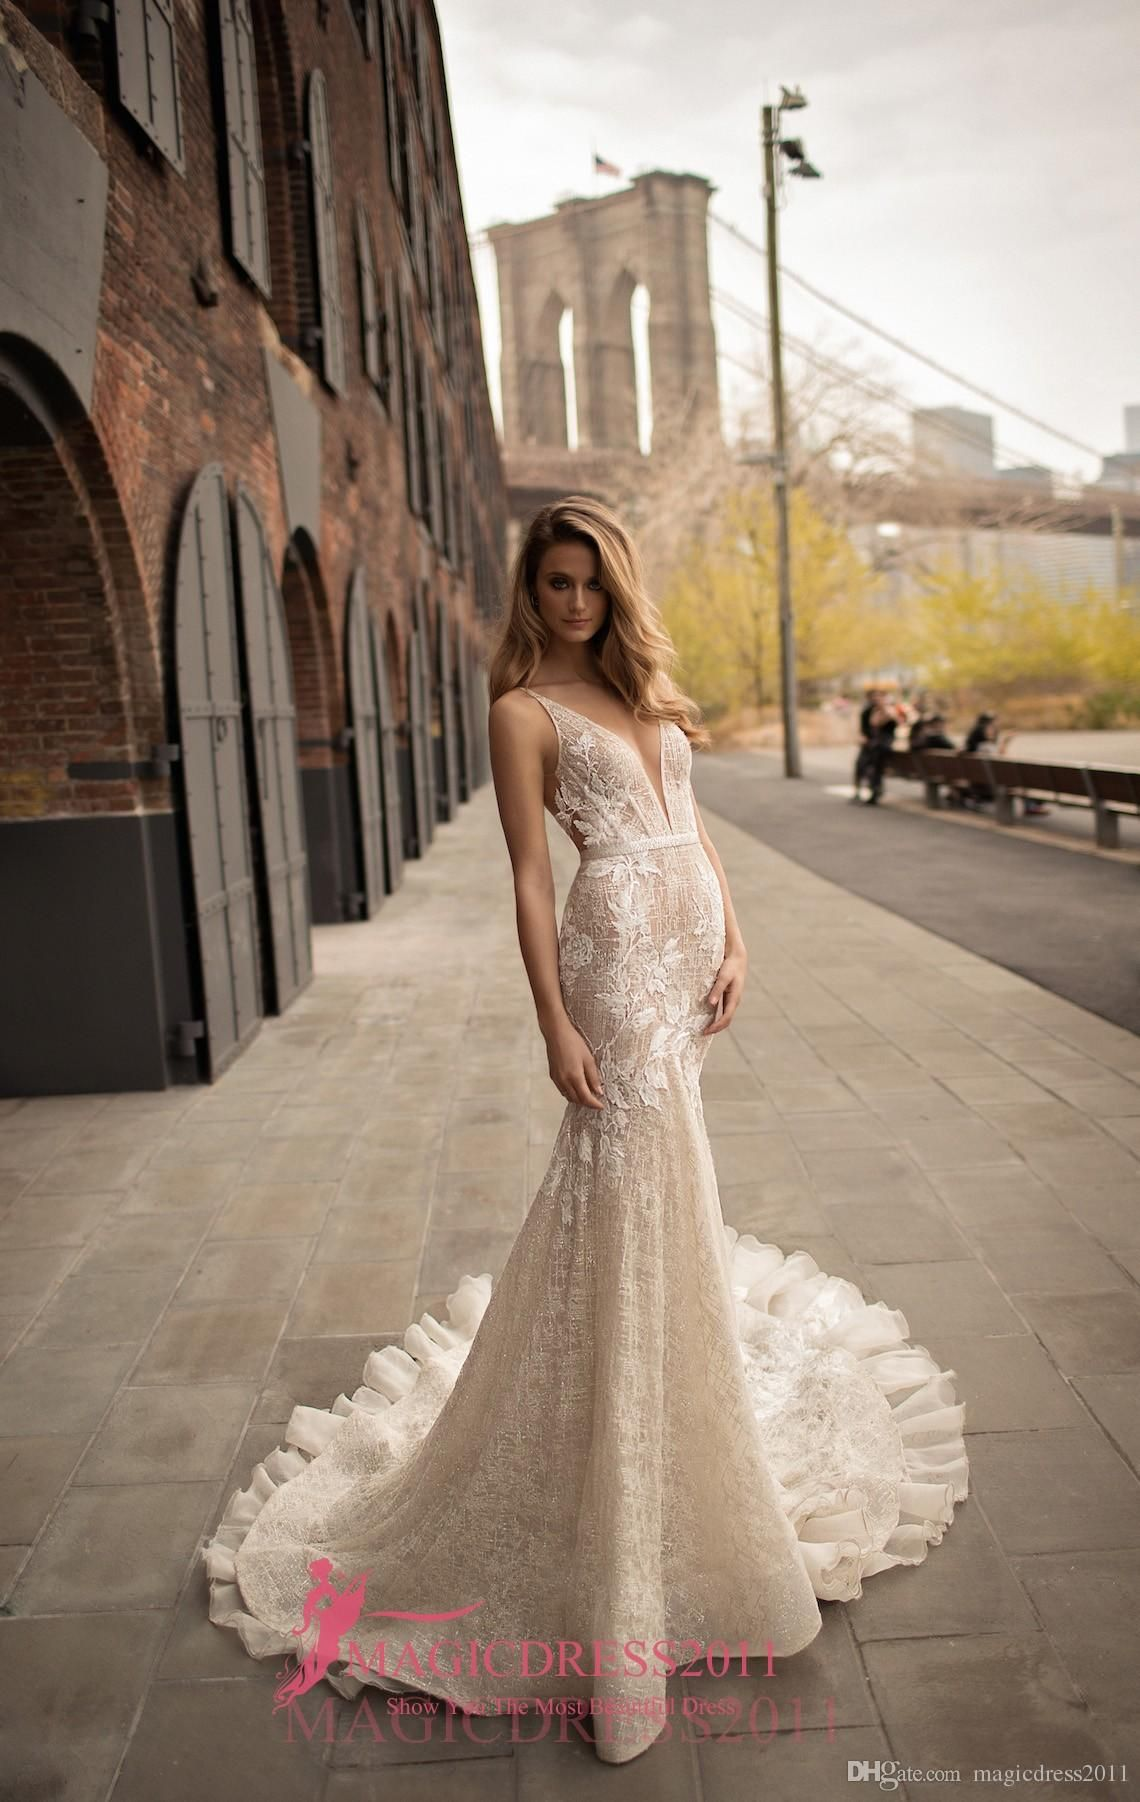 Berta wedding dress collection nigerian lace styles mermaid